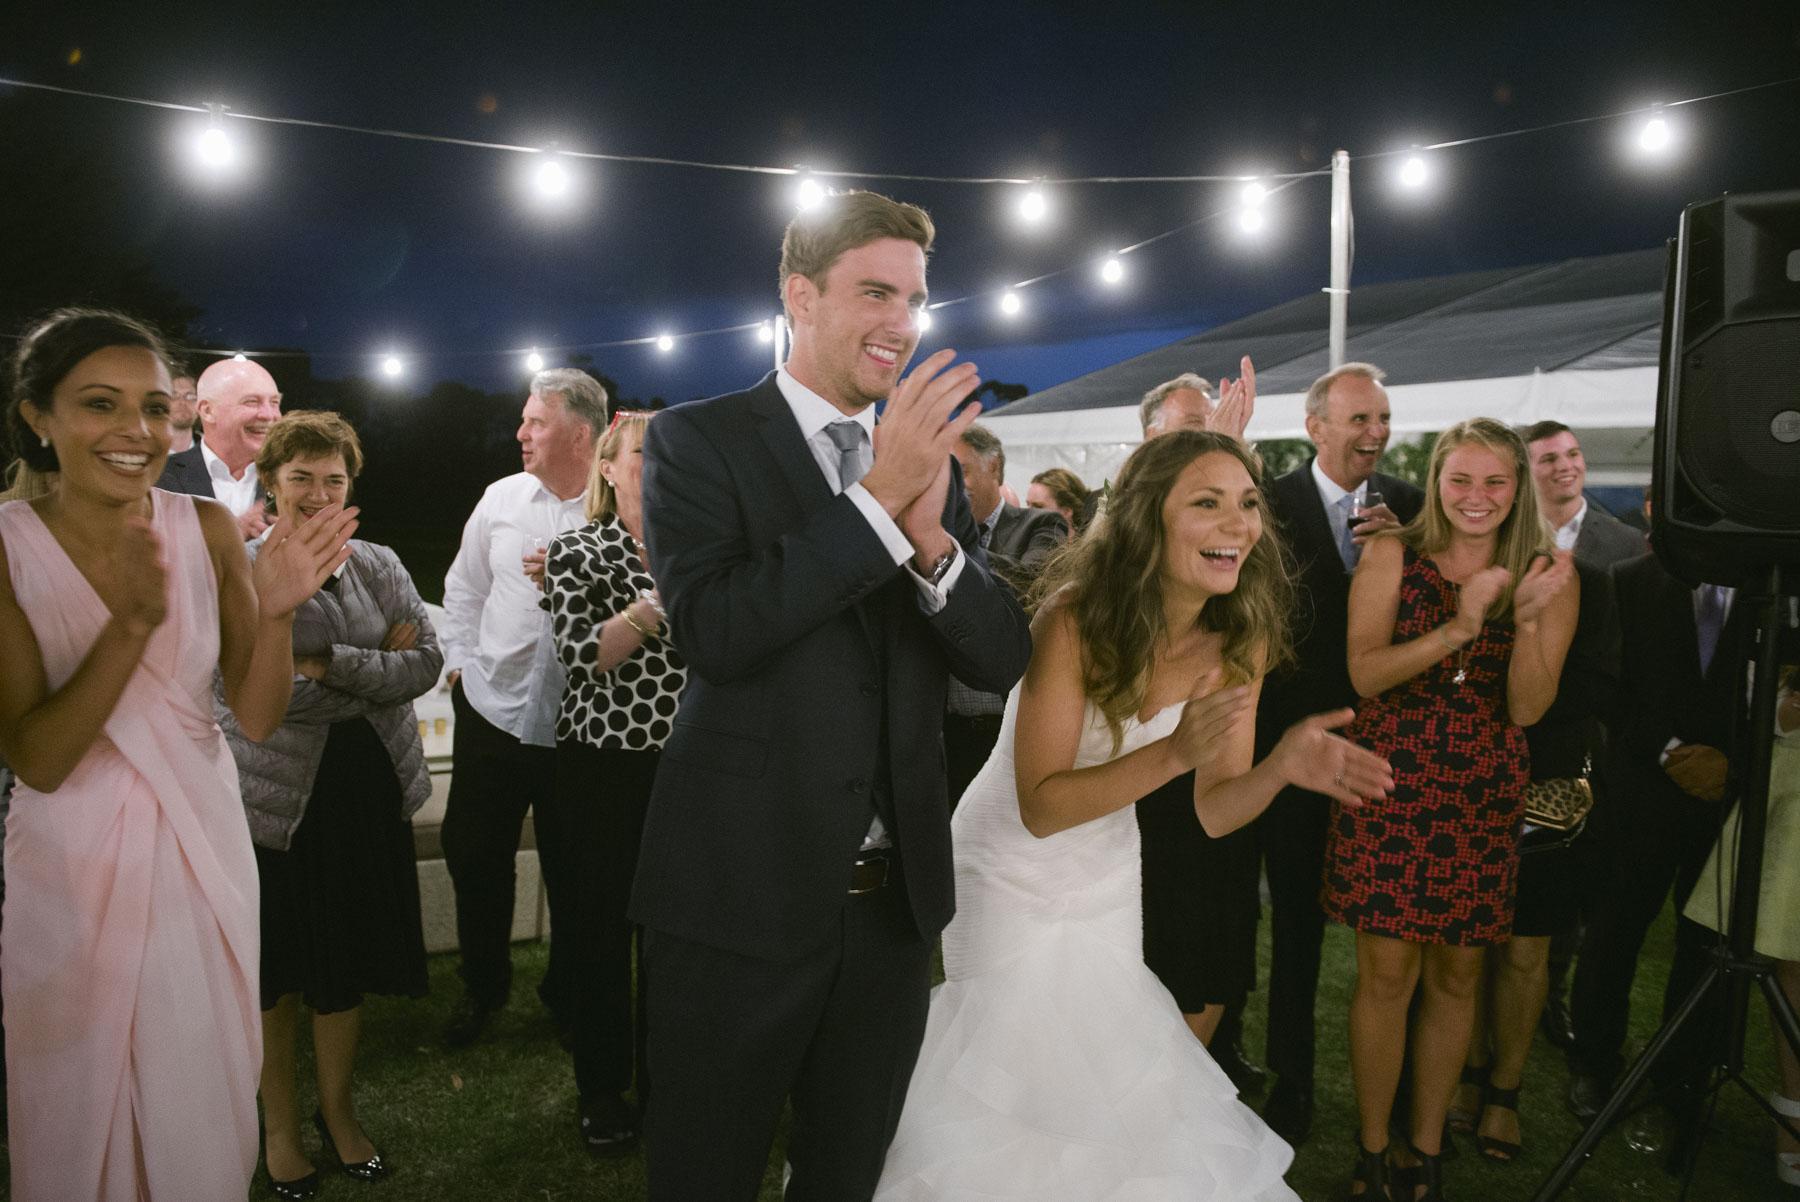 1501vand-440alan_moyle_wedding_portrait_brighton_bayside_werribee_estate_mansion_zoo_rustic_styled_garden_mansion_candid_documentry_victoria_whitelaw.jpg